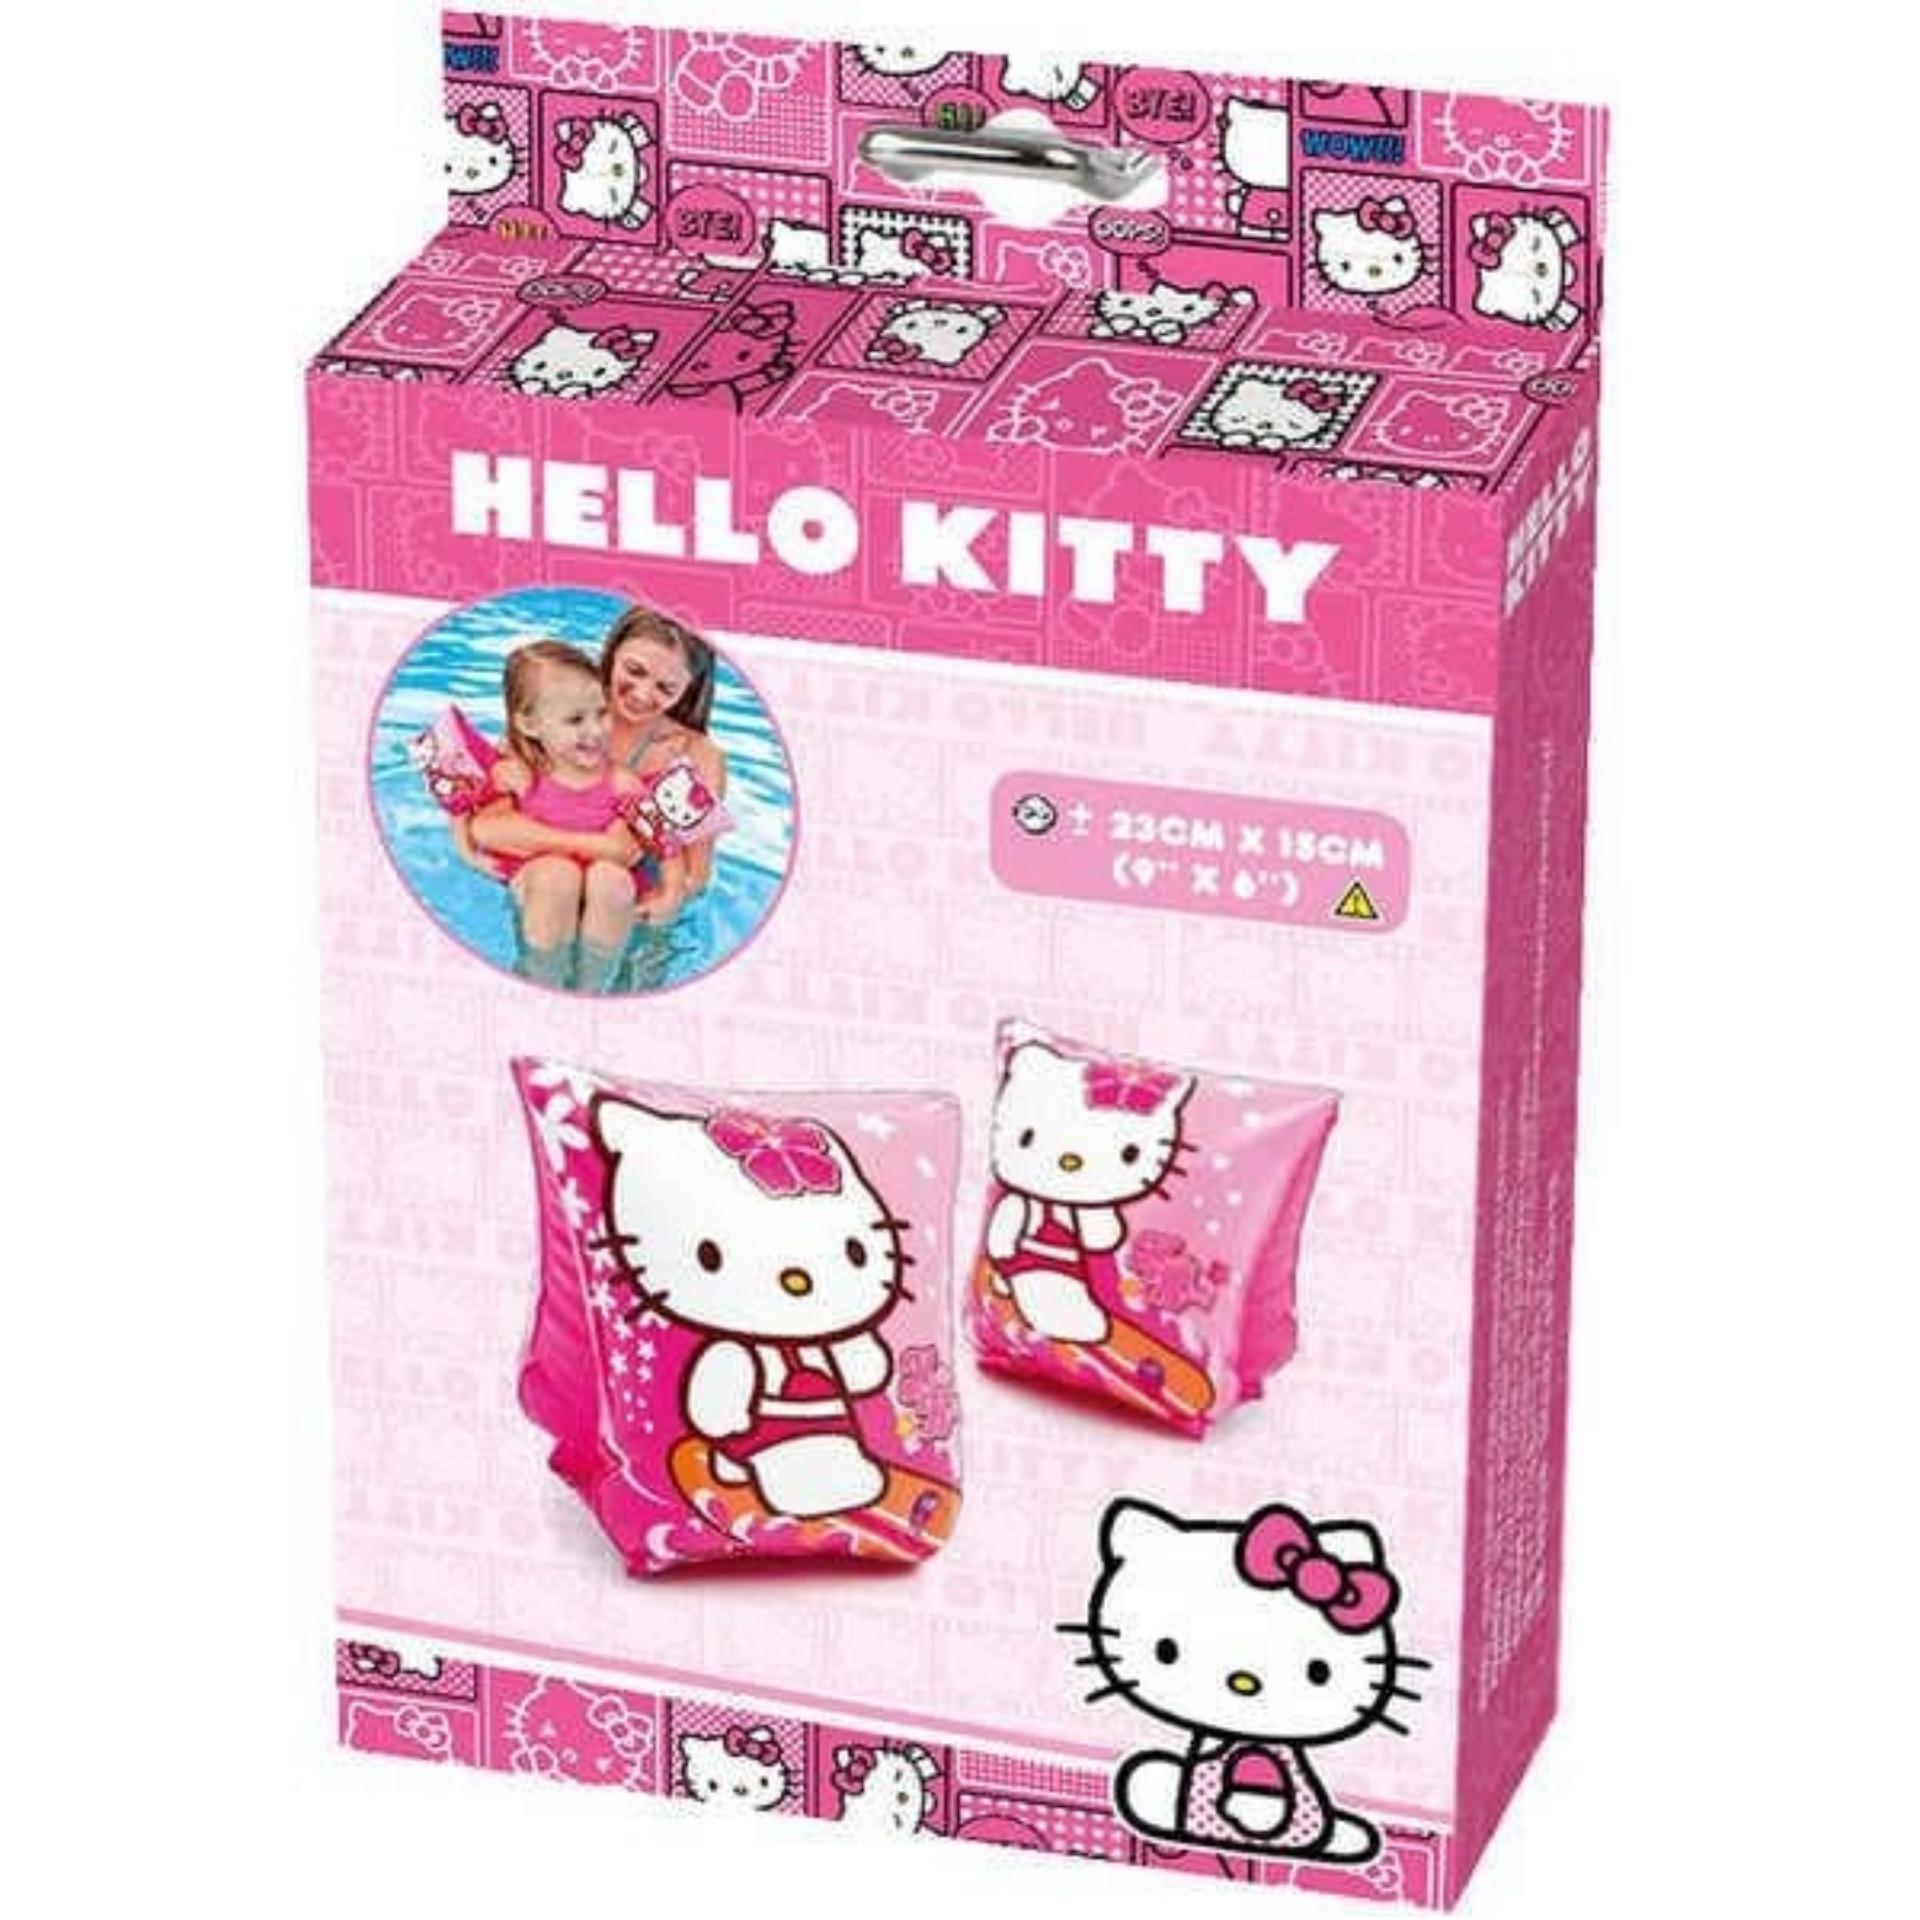 ... Lengan Source · Intex 56656 Pelampung renang tangan Ban renang tangan motif hello kitty